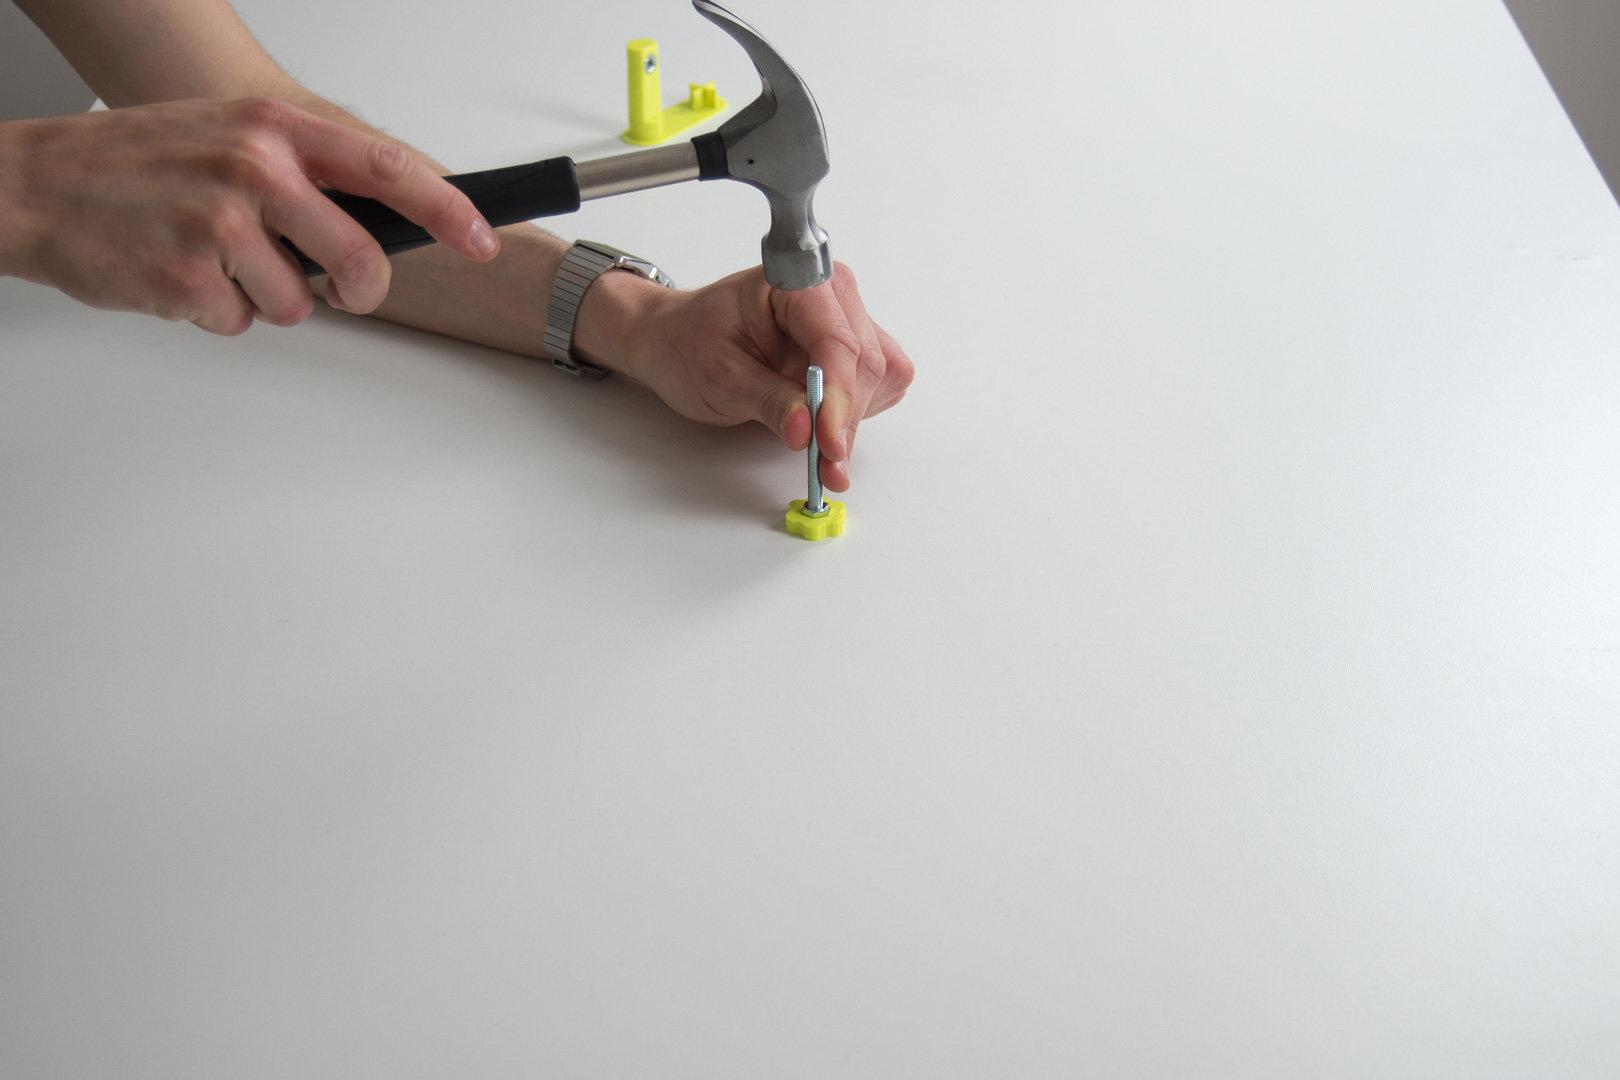 04 assemblage des plugs serre joint